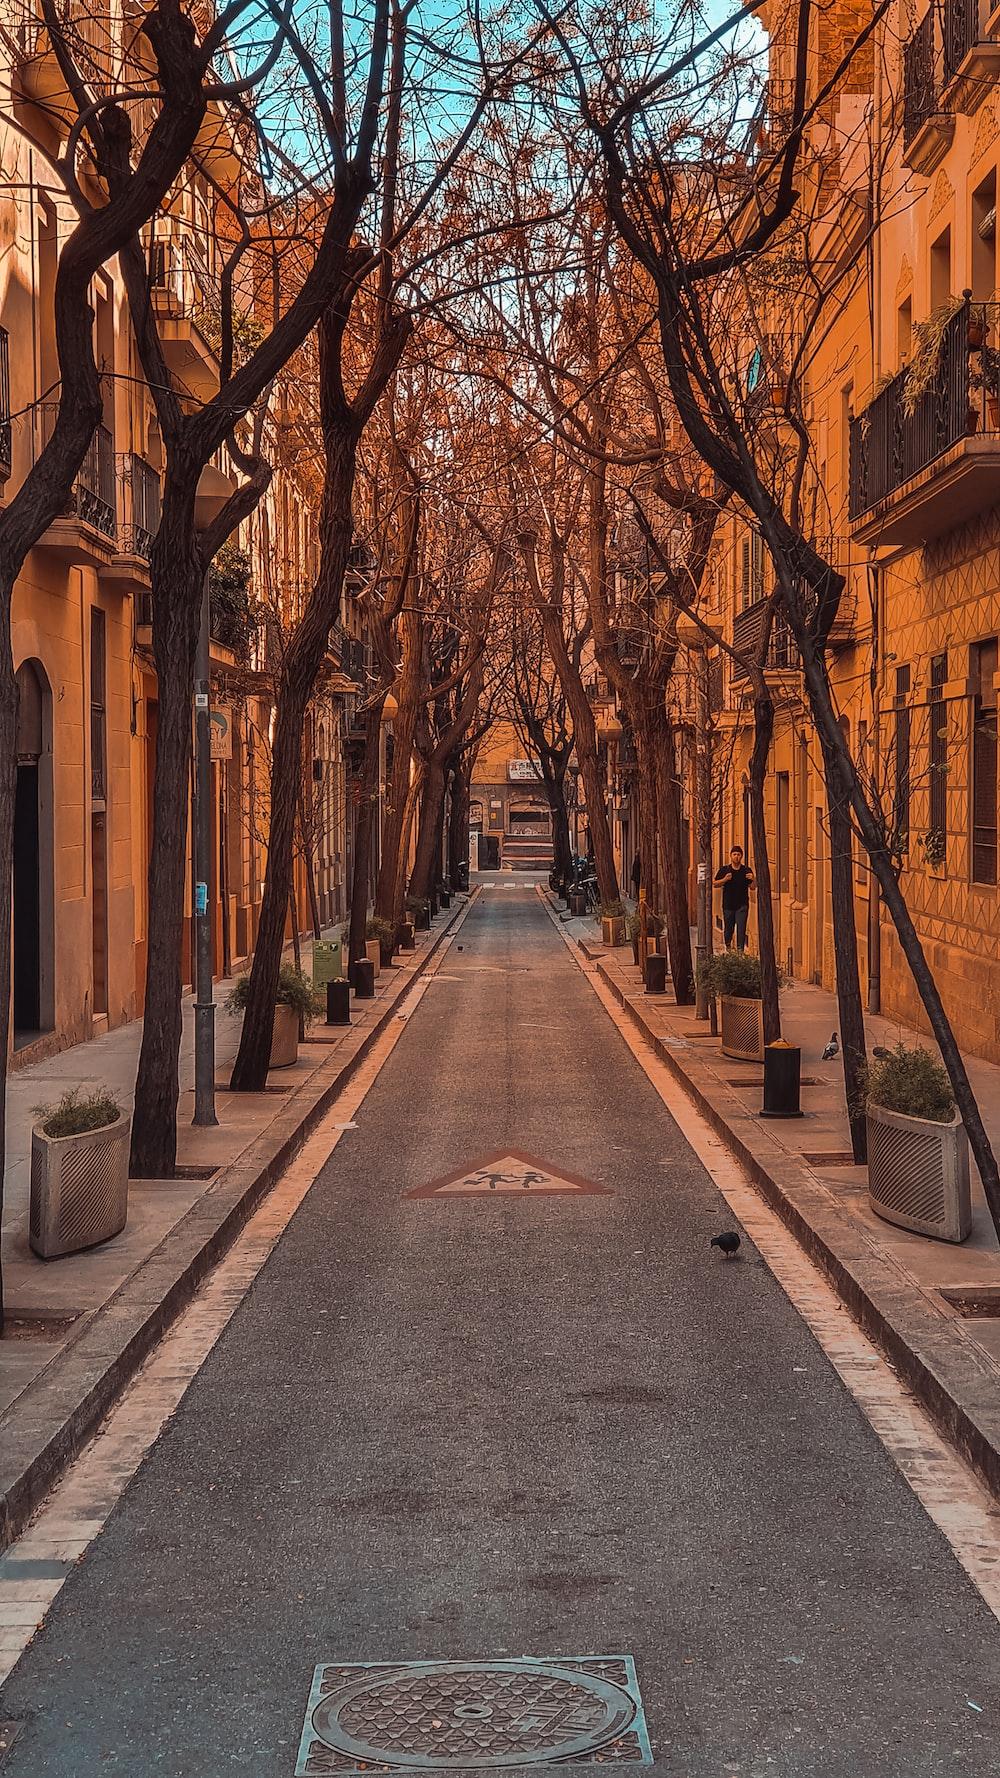 brown trees on sidewalk during daytime